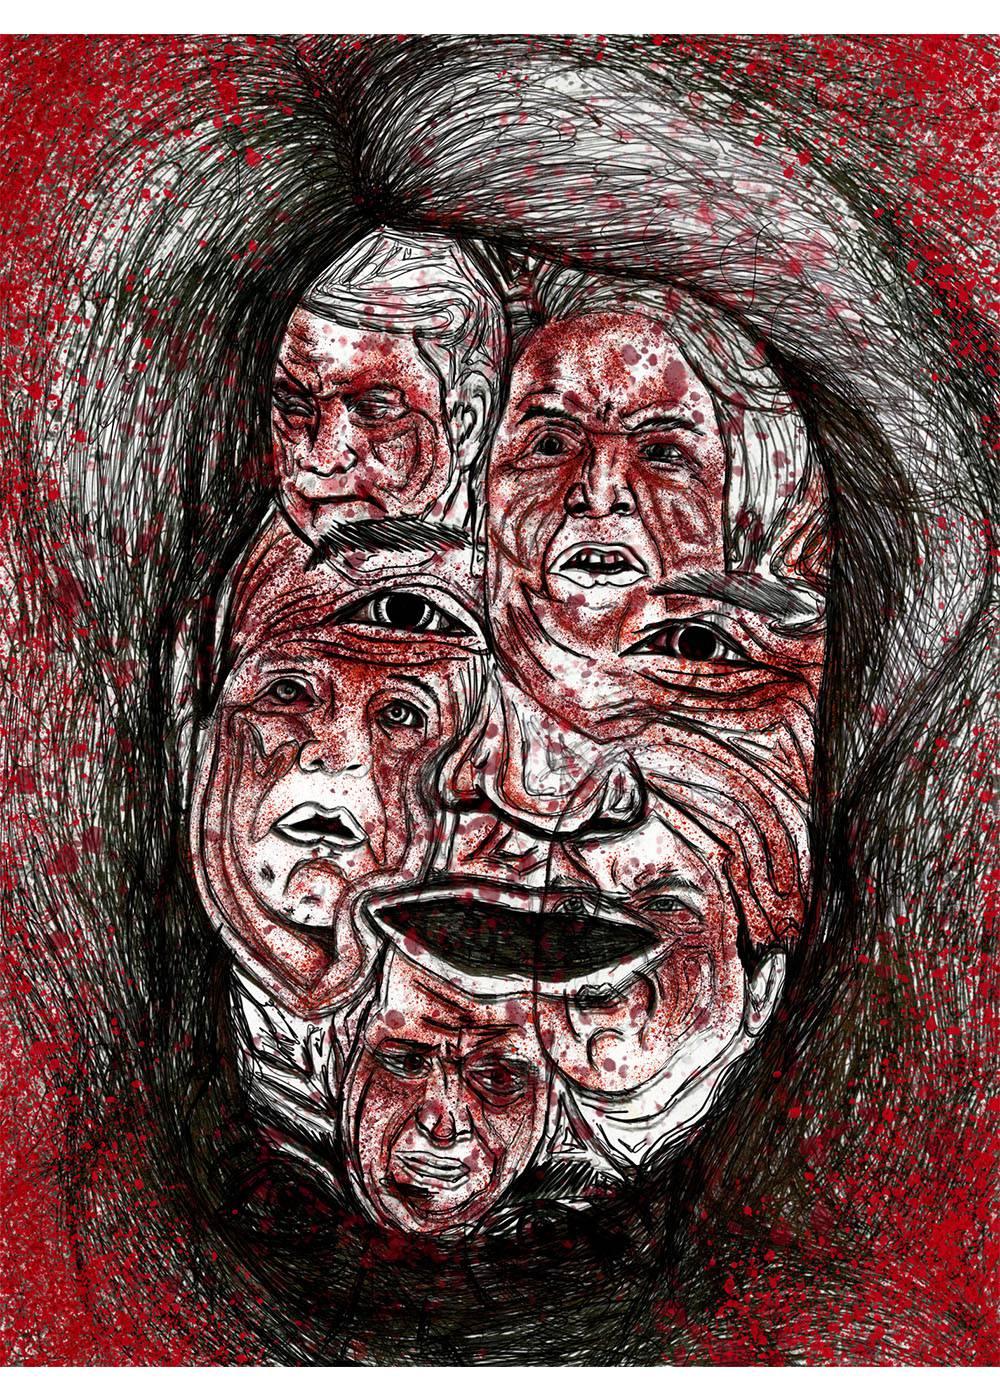 Brett Kavanaugh Many Faces Ballpoint Op-ed Gorry Art Disturbing